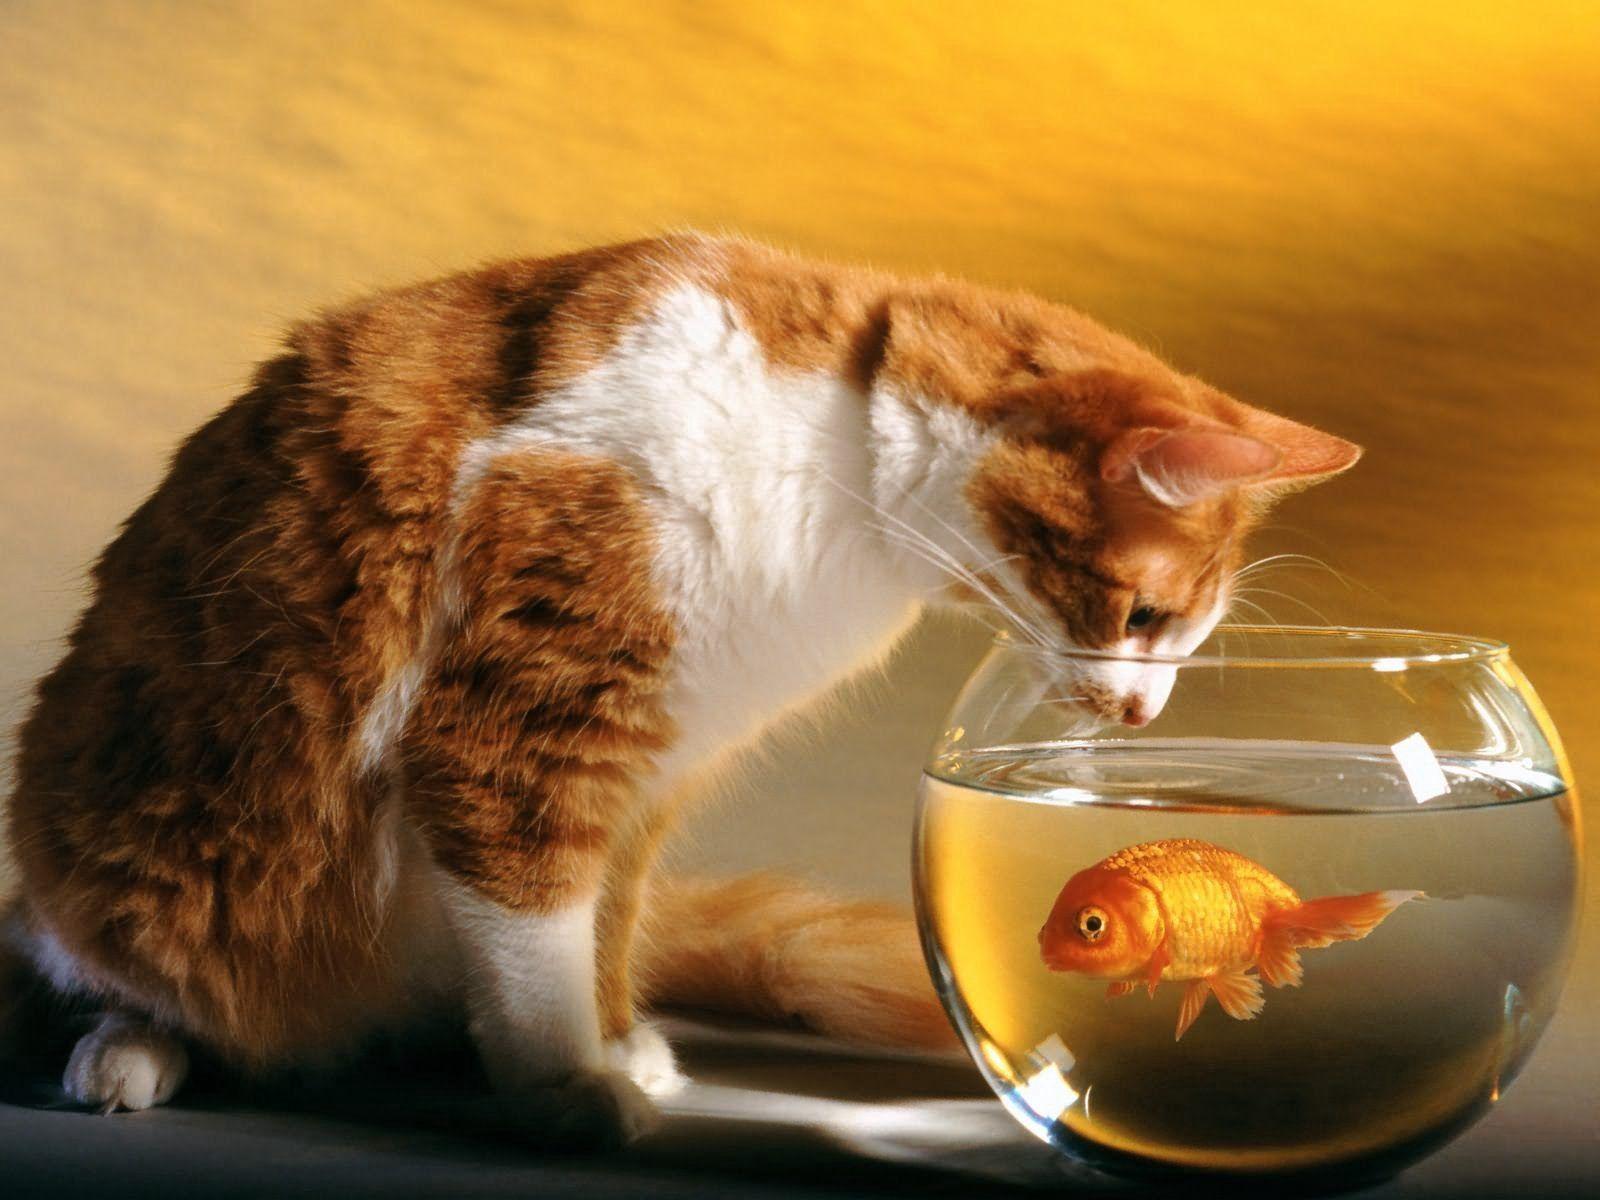 141265 Screensavers and Wallpapers Aquarium for phone. Download Animals, Cat, Aquarium, Fish pictures for free